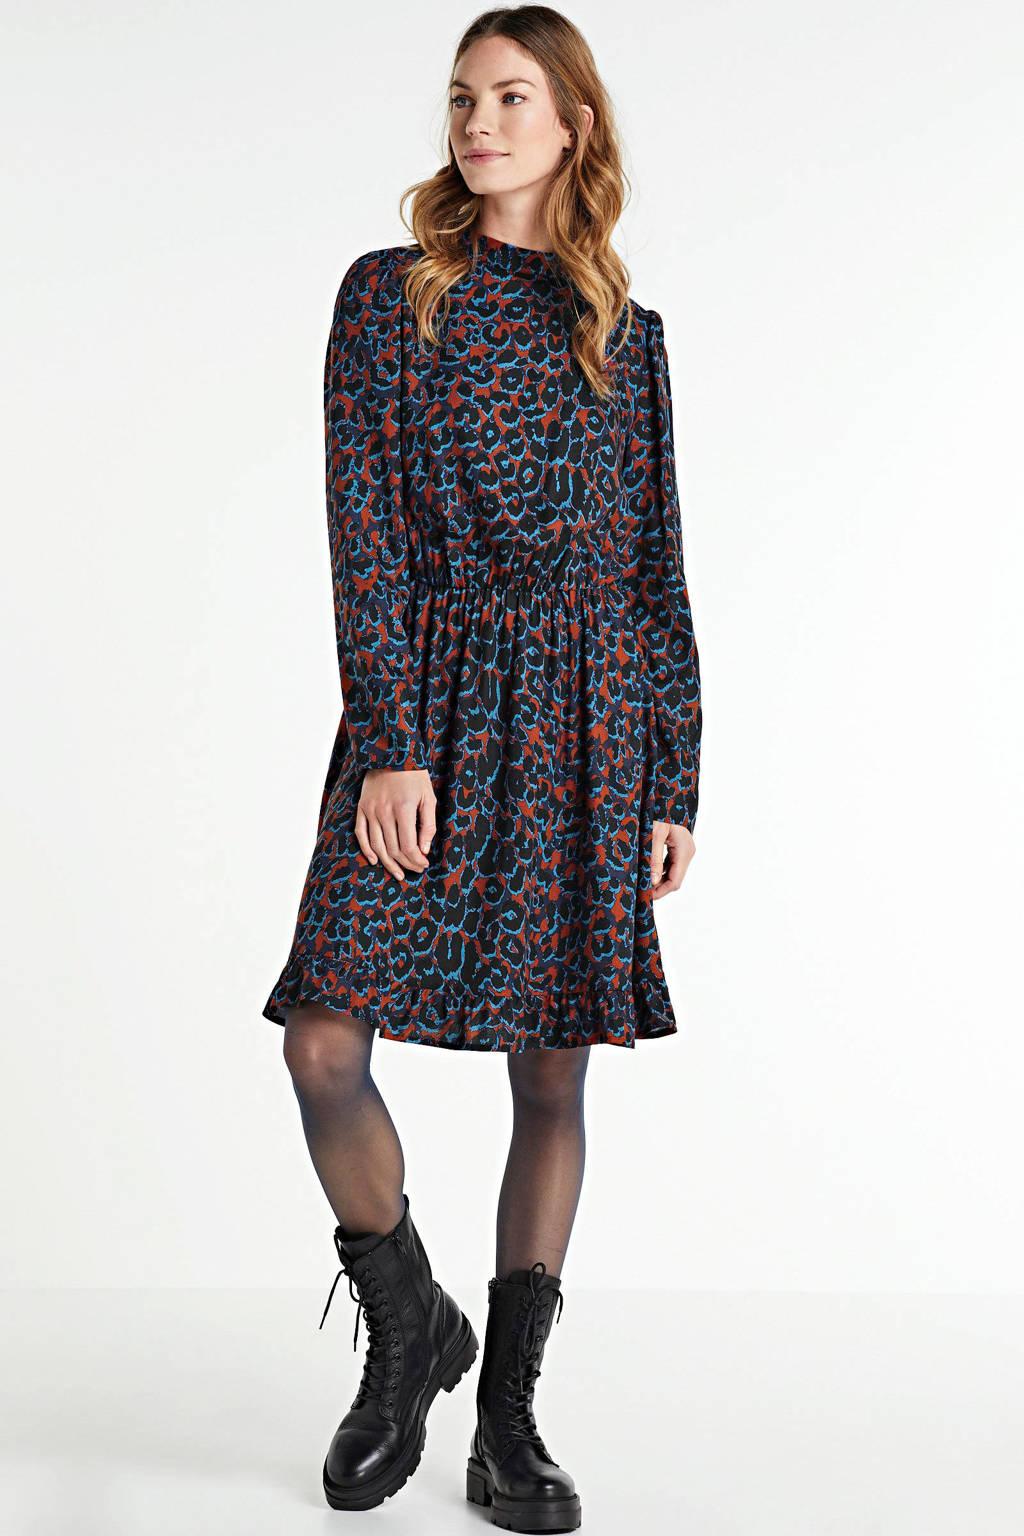 anytime jurk met all over print blauw/rood, Zwart/rood